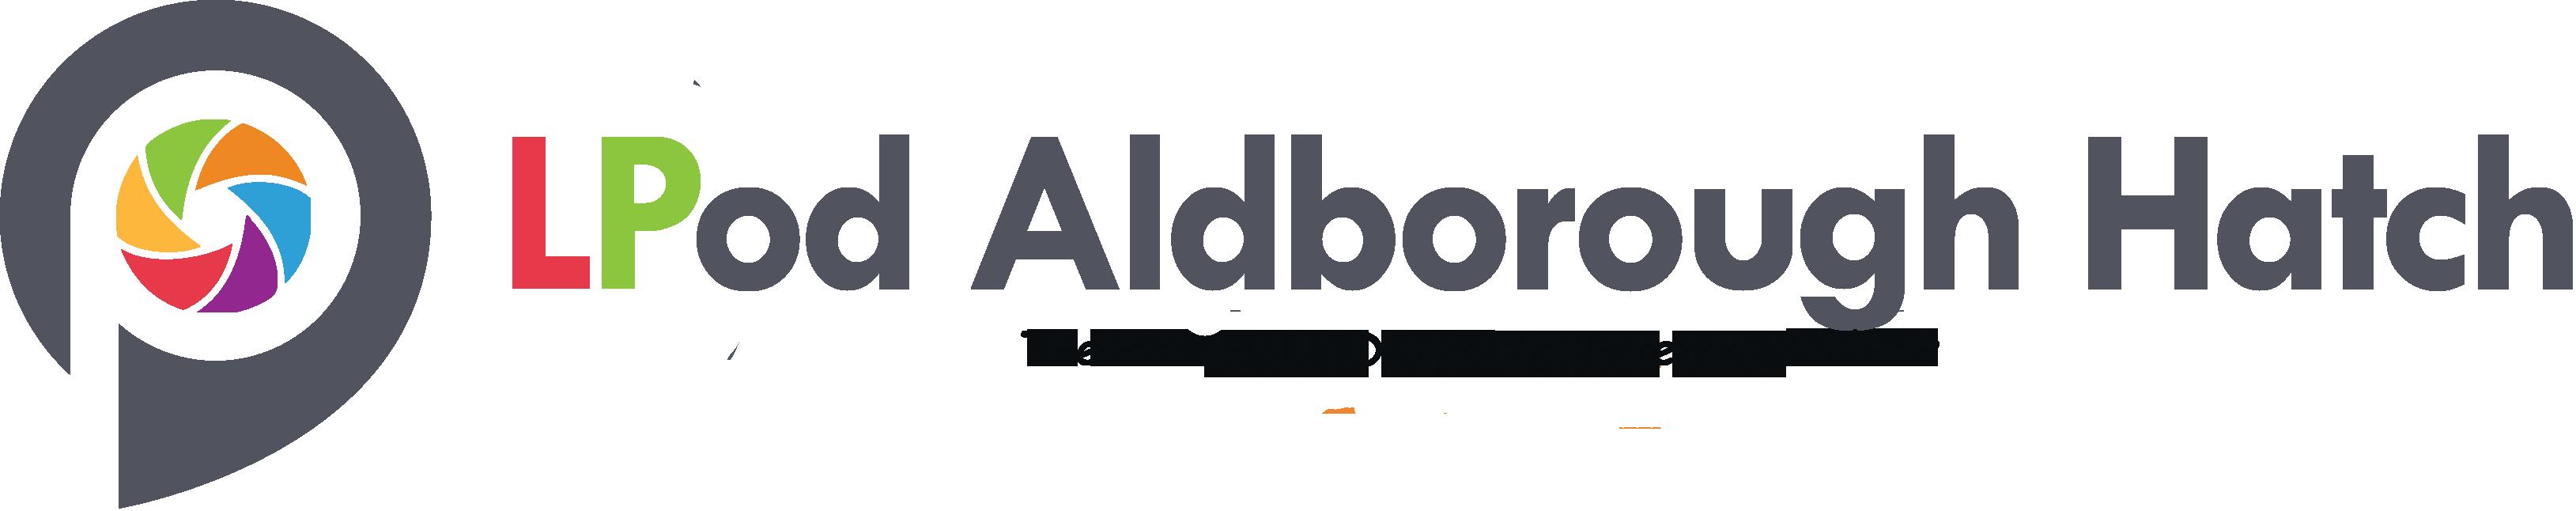 intensive driving courses Aldborough Hatch, fasy pass driving courses Aldborough Hatch, one week driving courses Aldborough Hatch